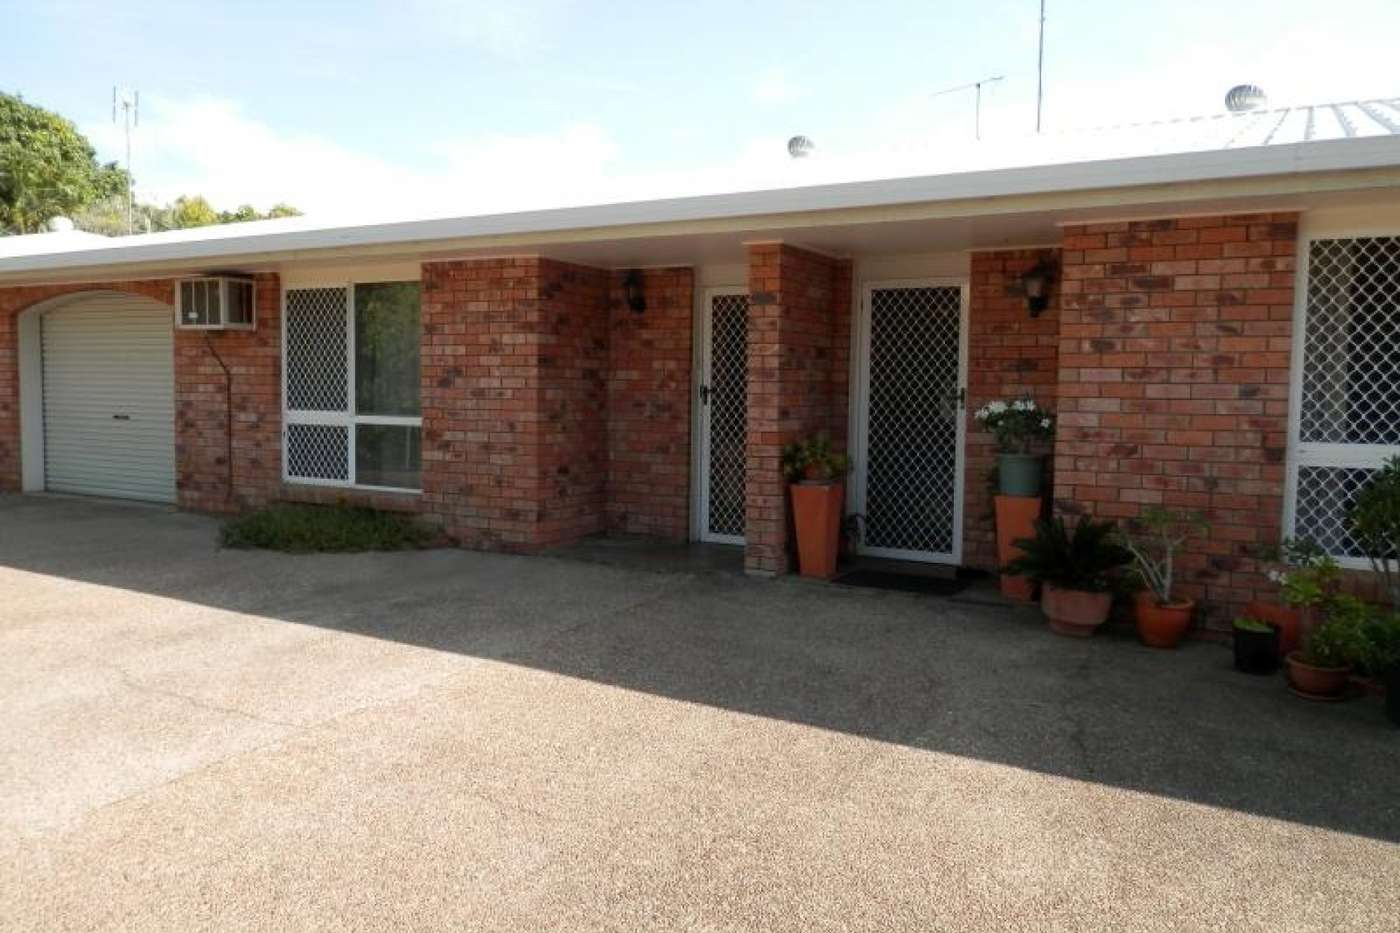 Main view of Homely unit listing, 2/34 MacMillan  Street, Ayr, QLD 4807